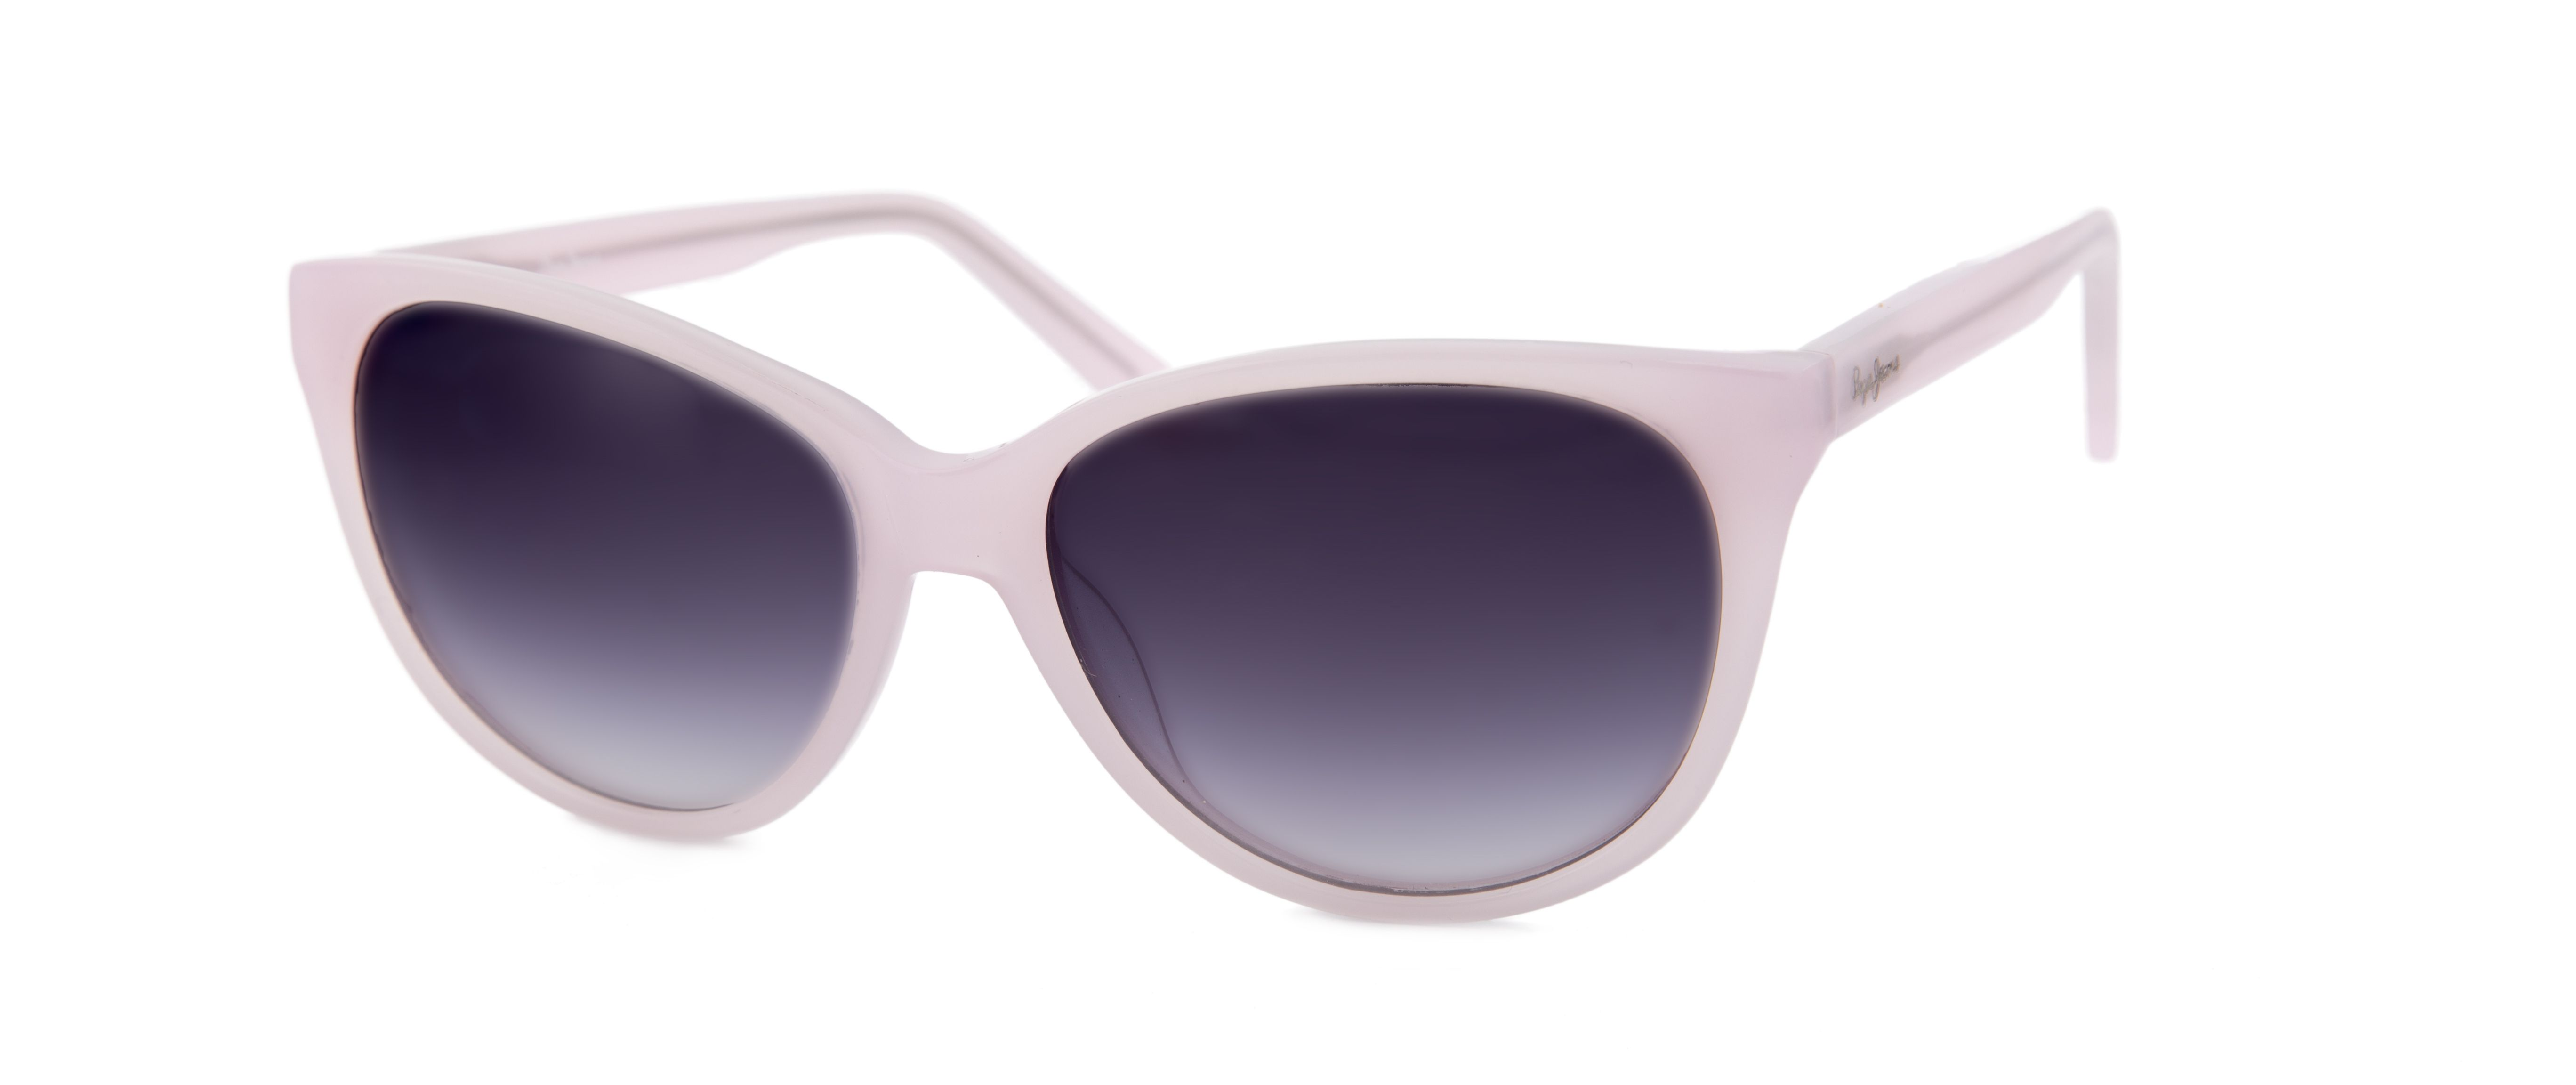 d4ebab4524 Gafas de sol Pepe Jeans para Opticalia. Montura en color rosa pastel ...